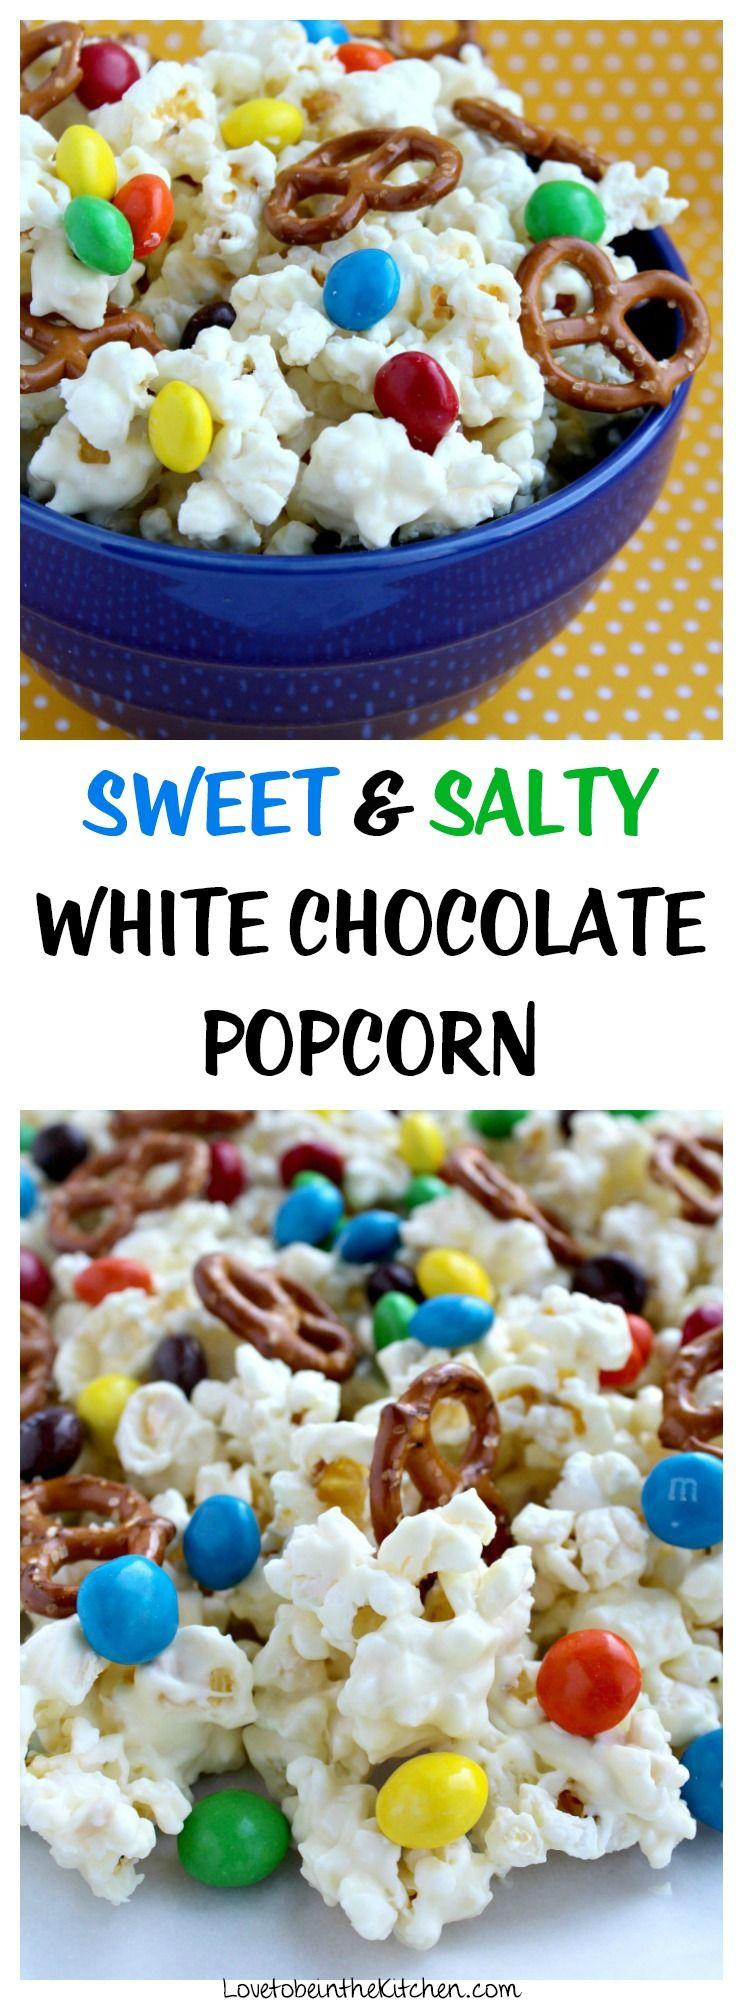 Sweet and Salty White Chocolate Popcorn #epicmovie